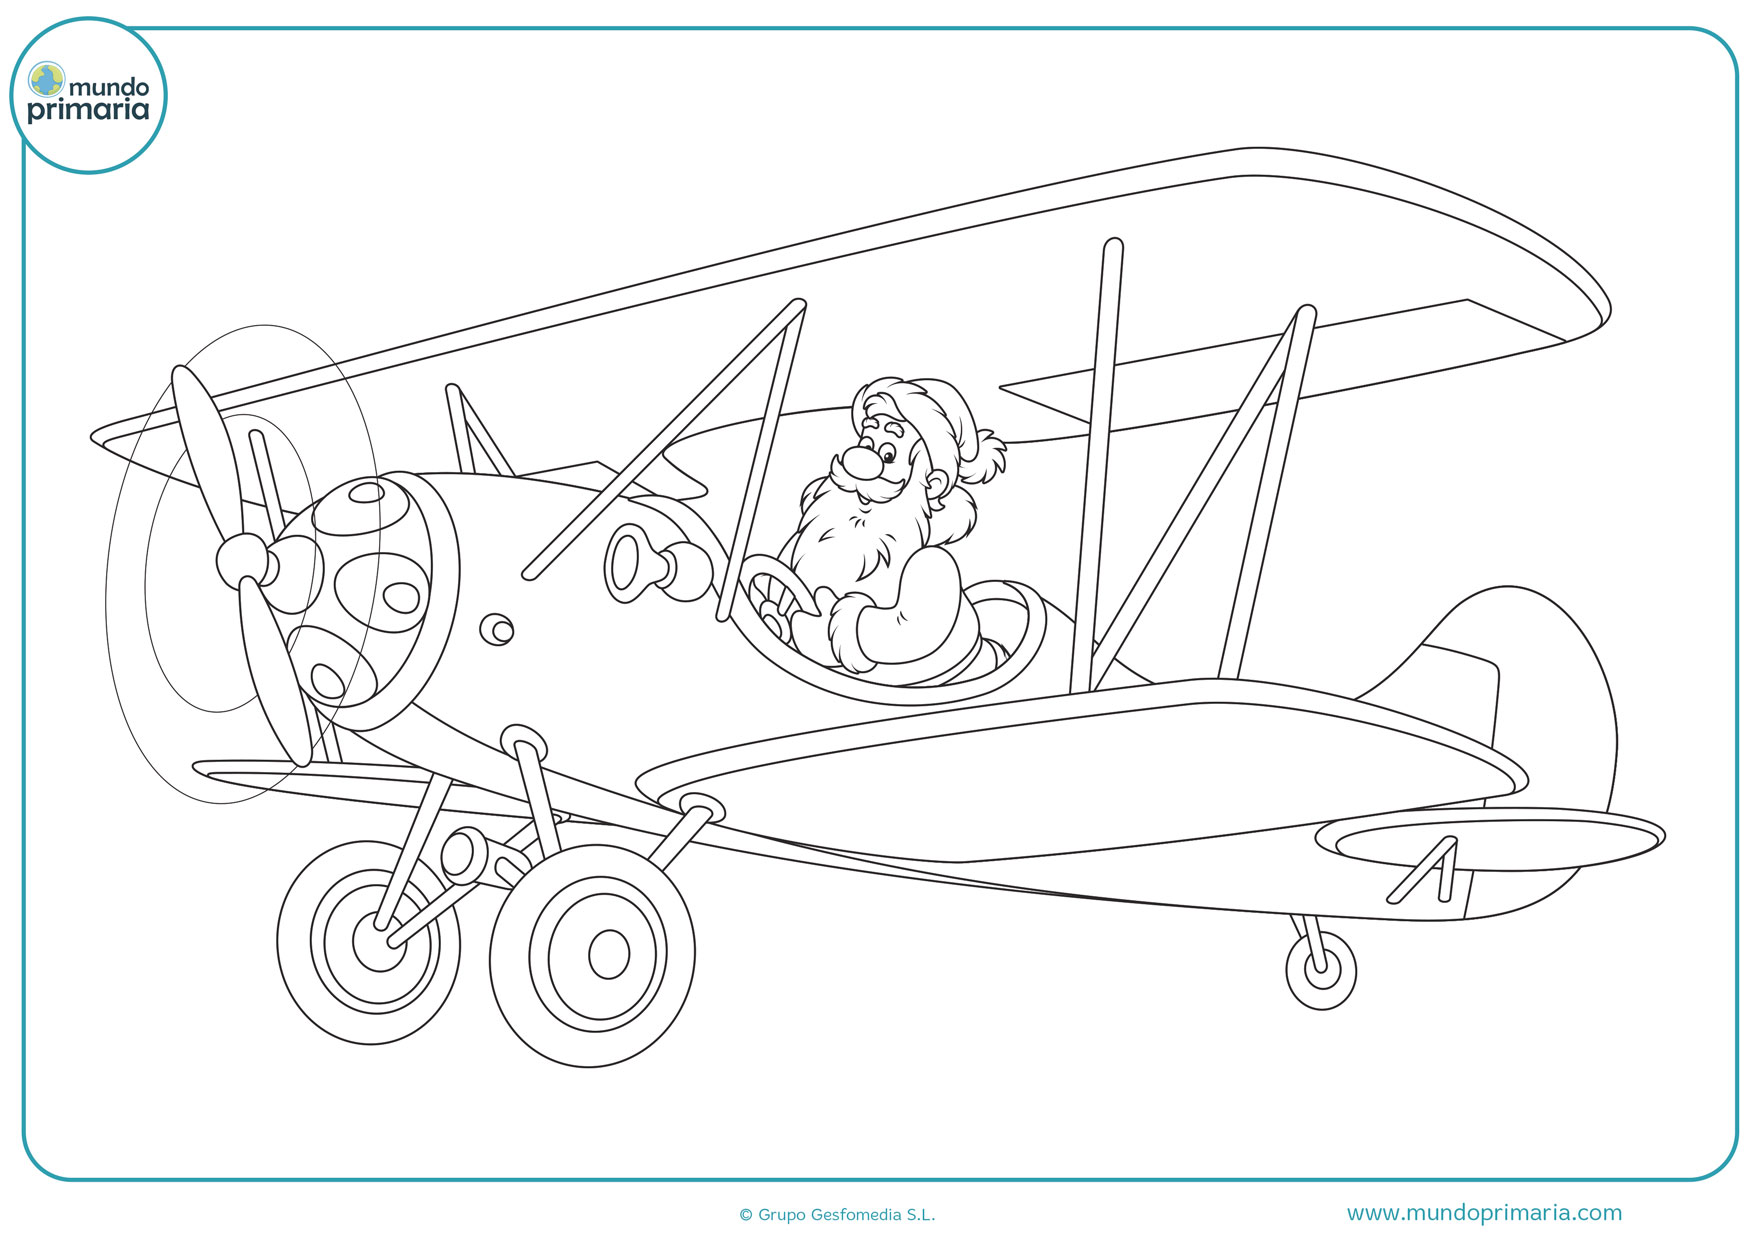 dibujos para colorear e imprimir de aviones de disney